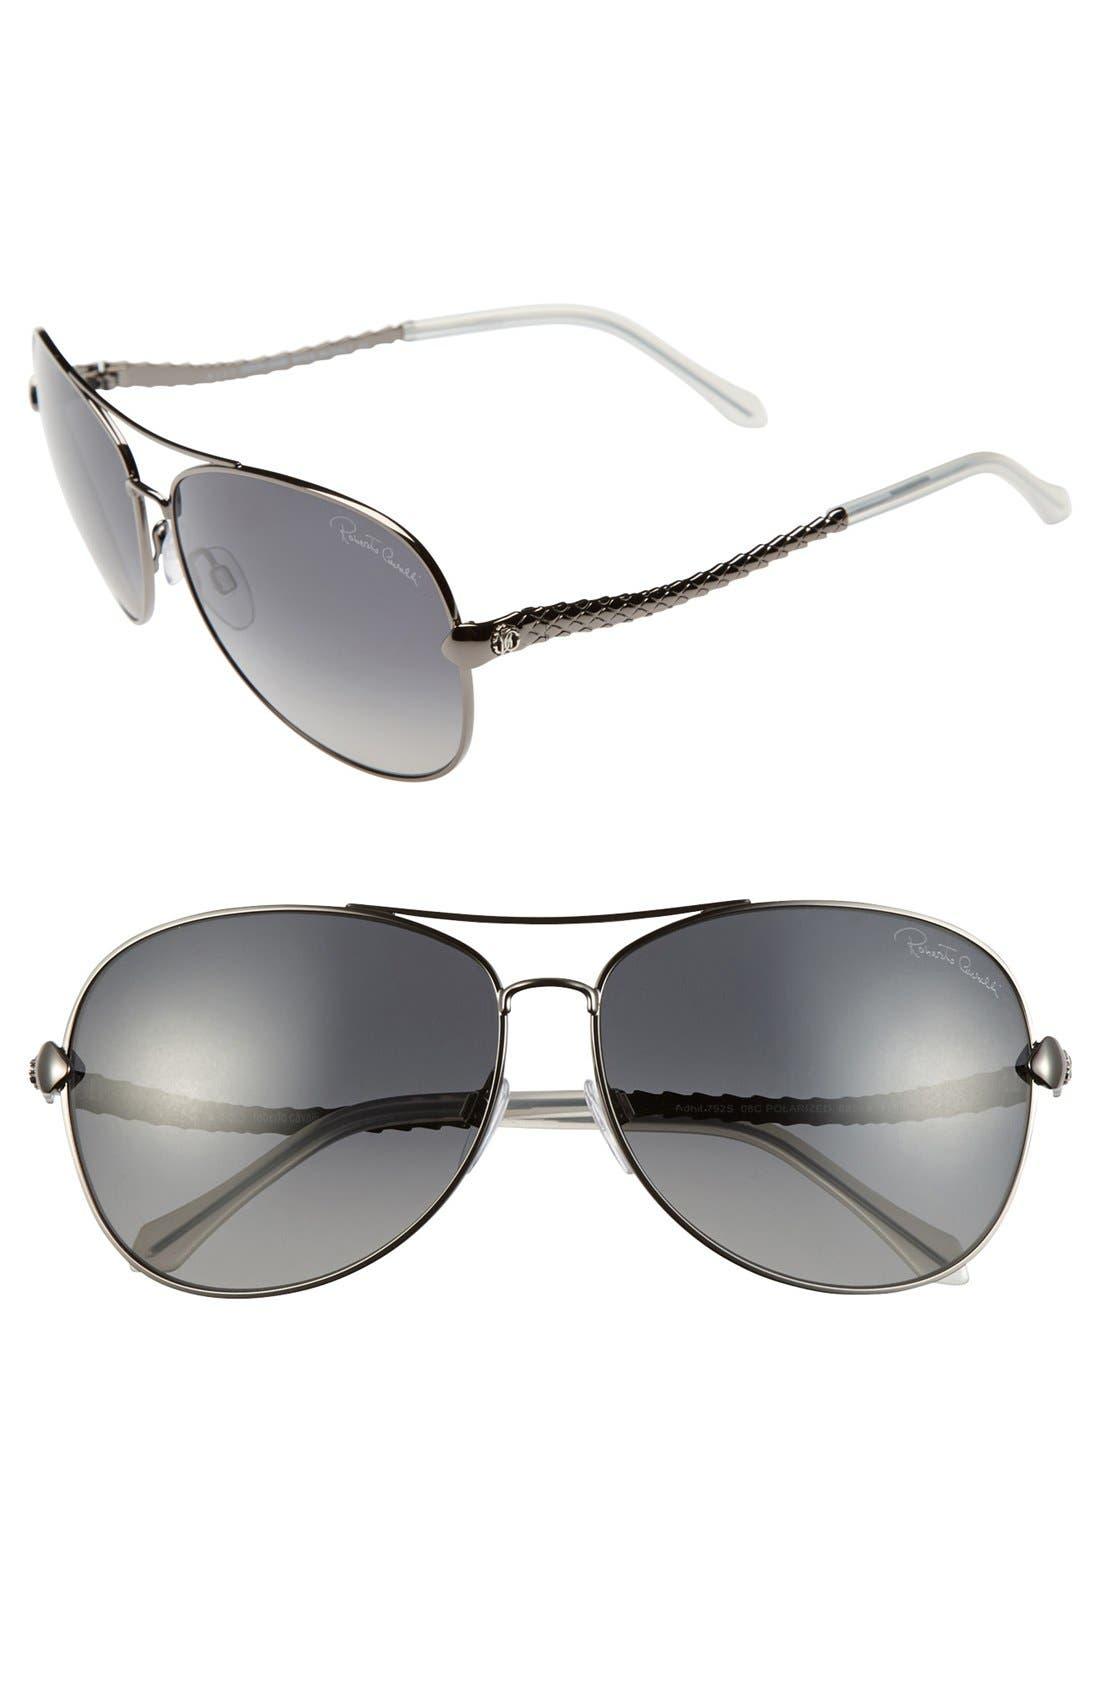 Main Image - Roberto Cavalli 'Adhil' 62mm Polarized Aviator Sunglasses